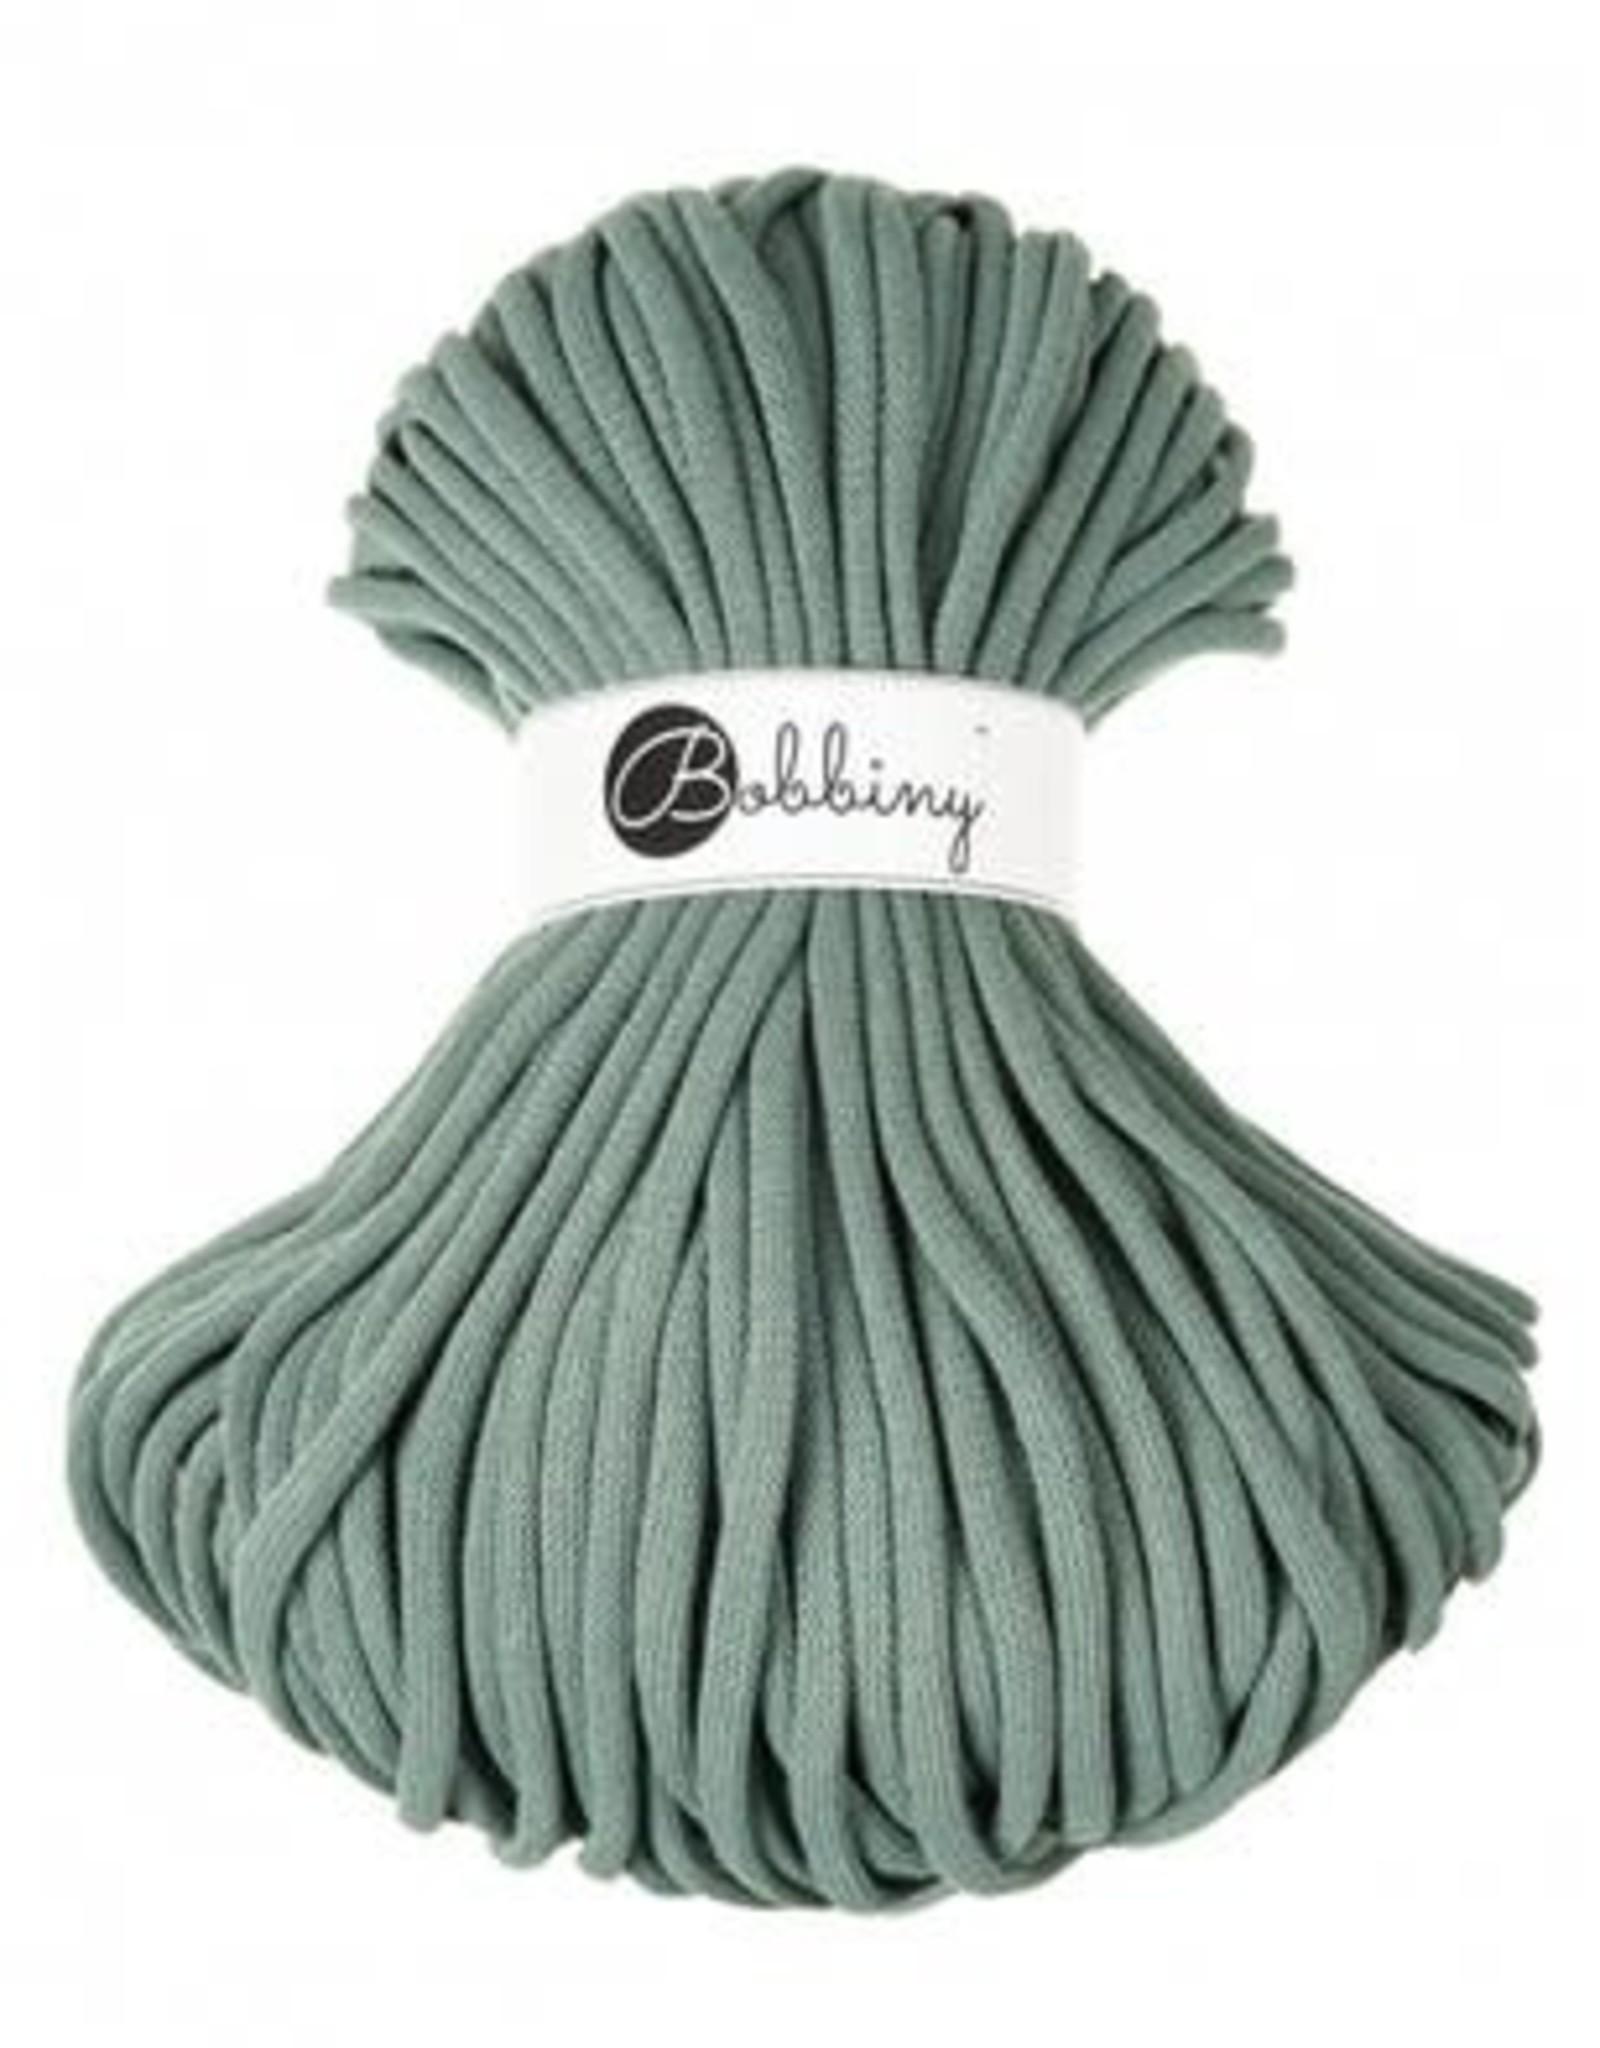 Bobbiny Bobbiny - Jumbo 9MM Laurel